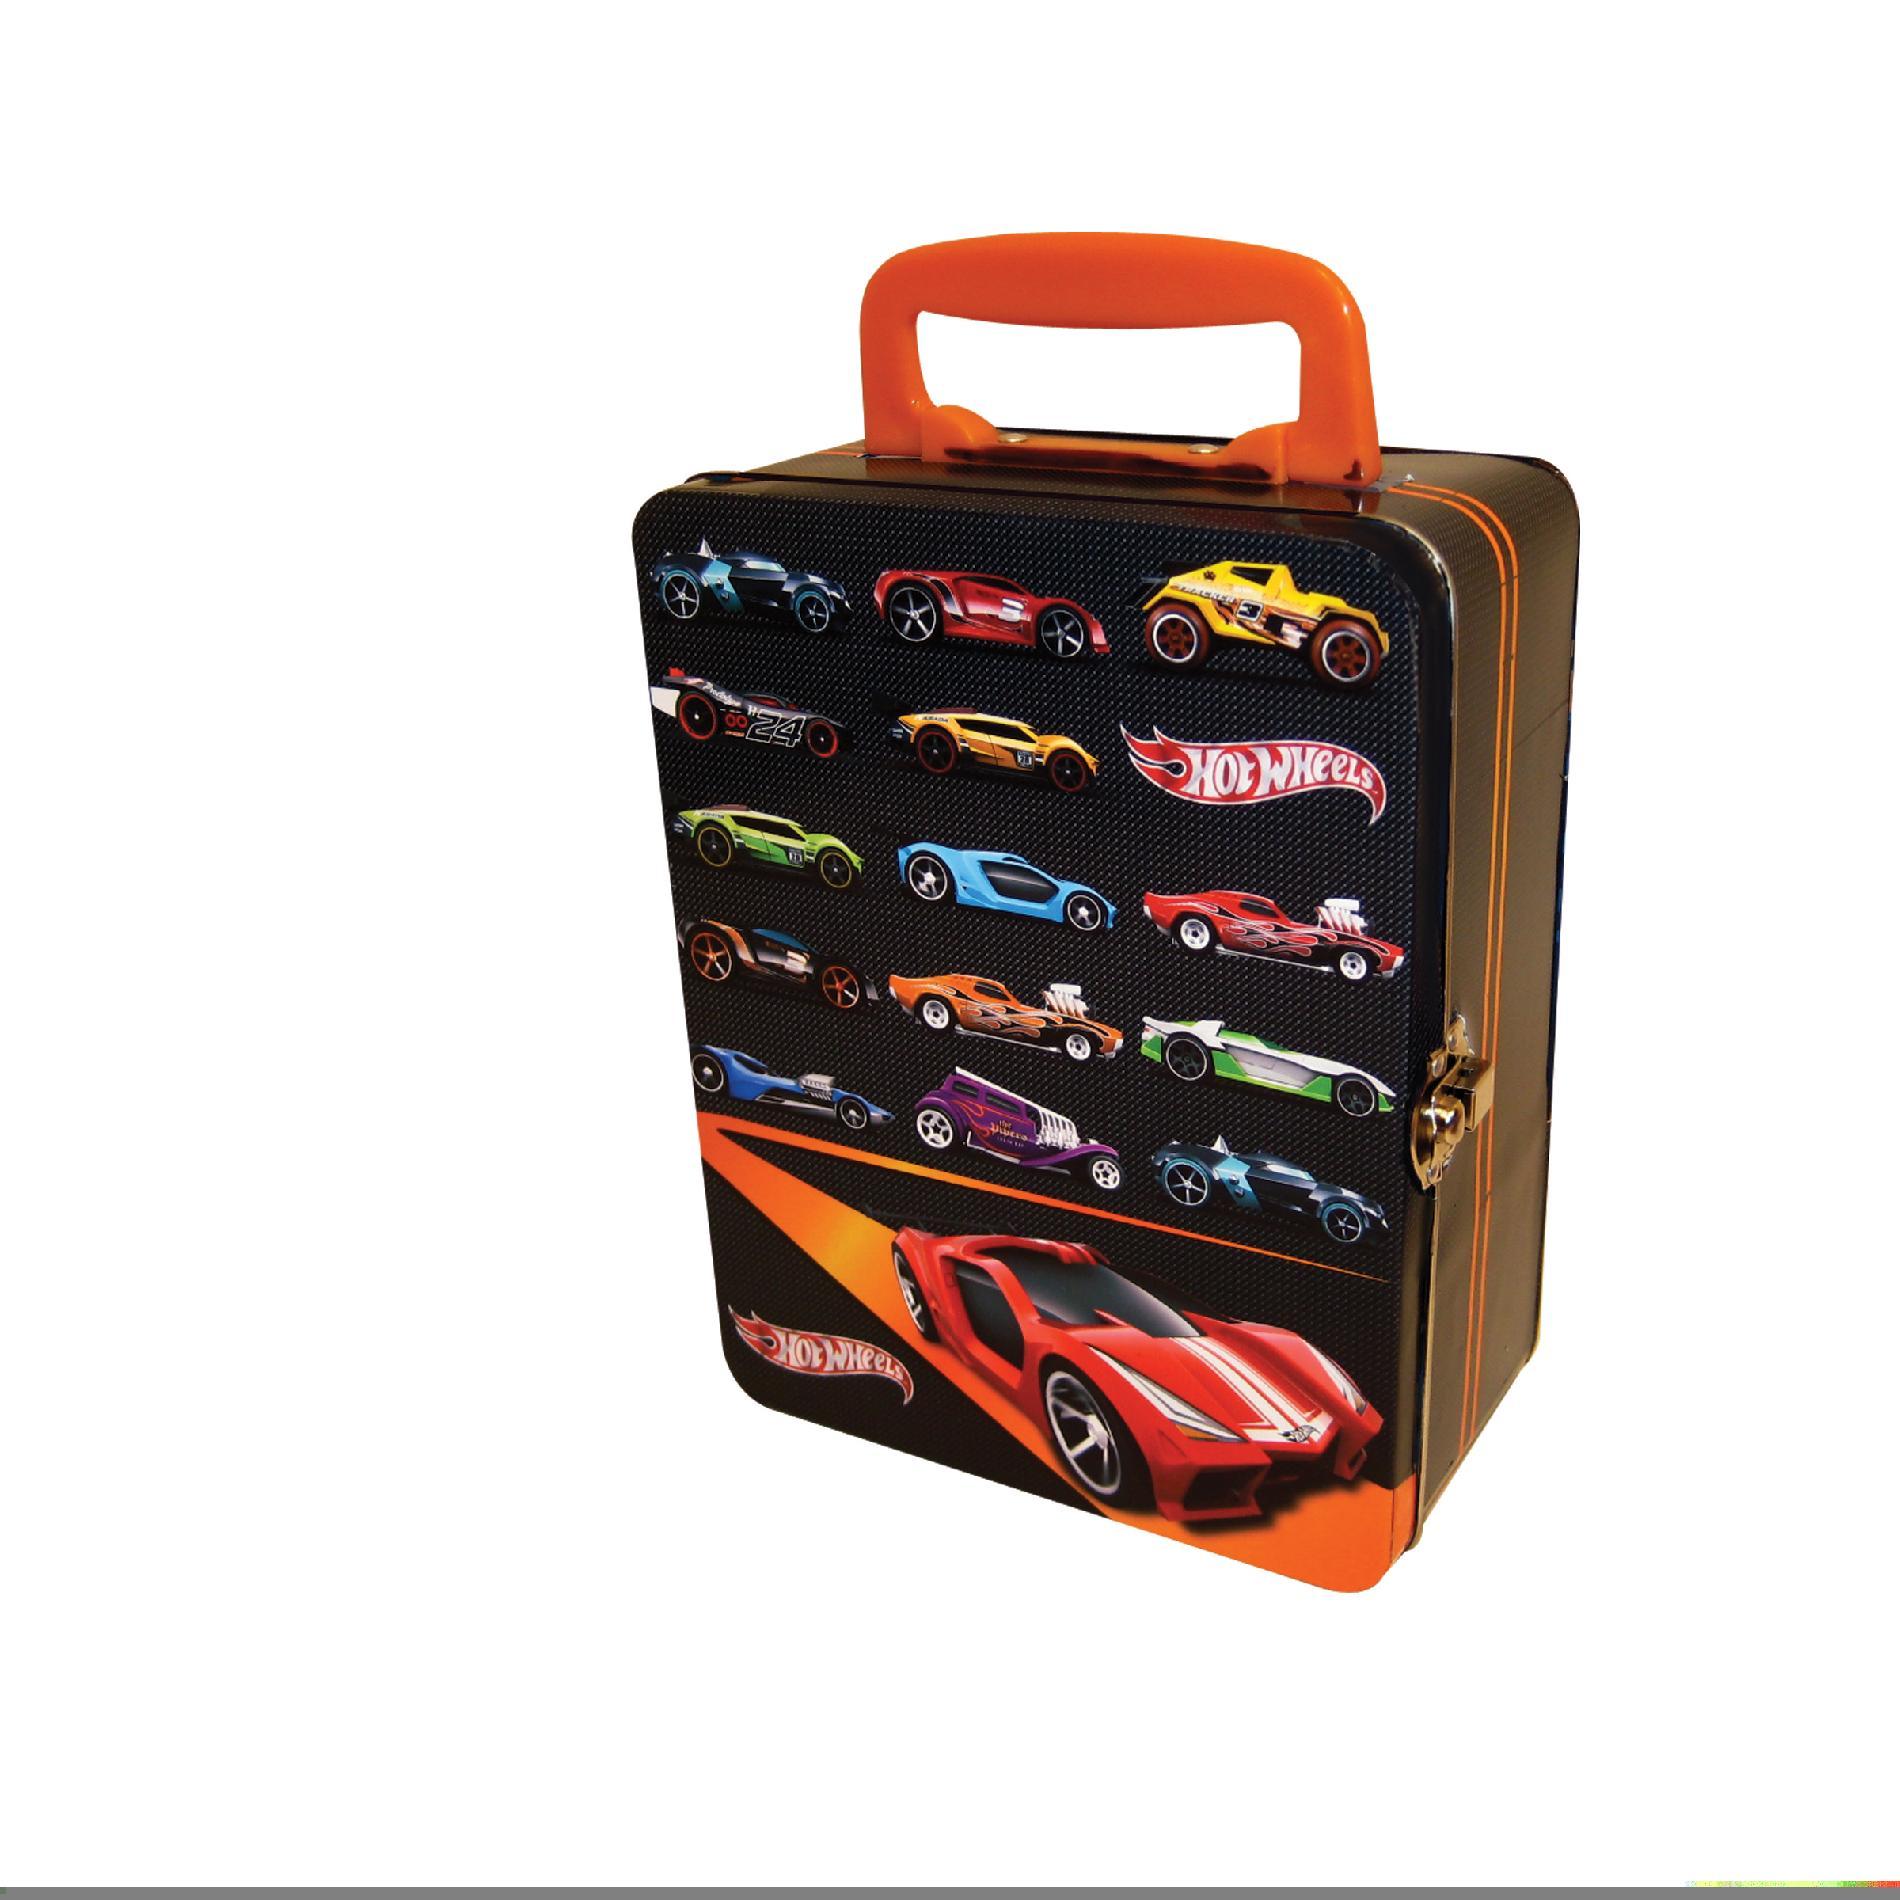 Hot Wheels Toys : Hot wheels neat oh car vintage tin toys